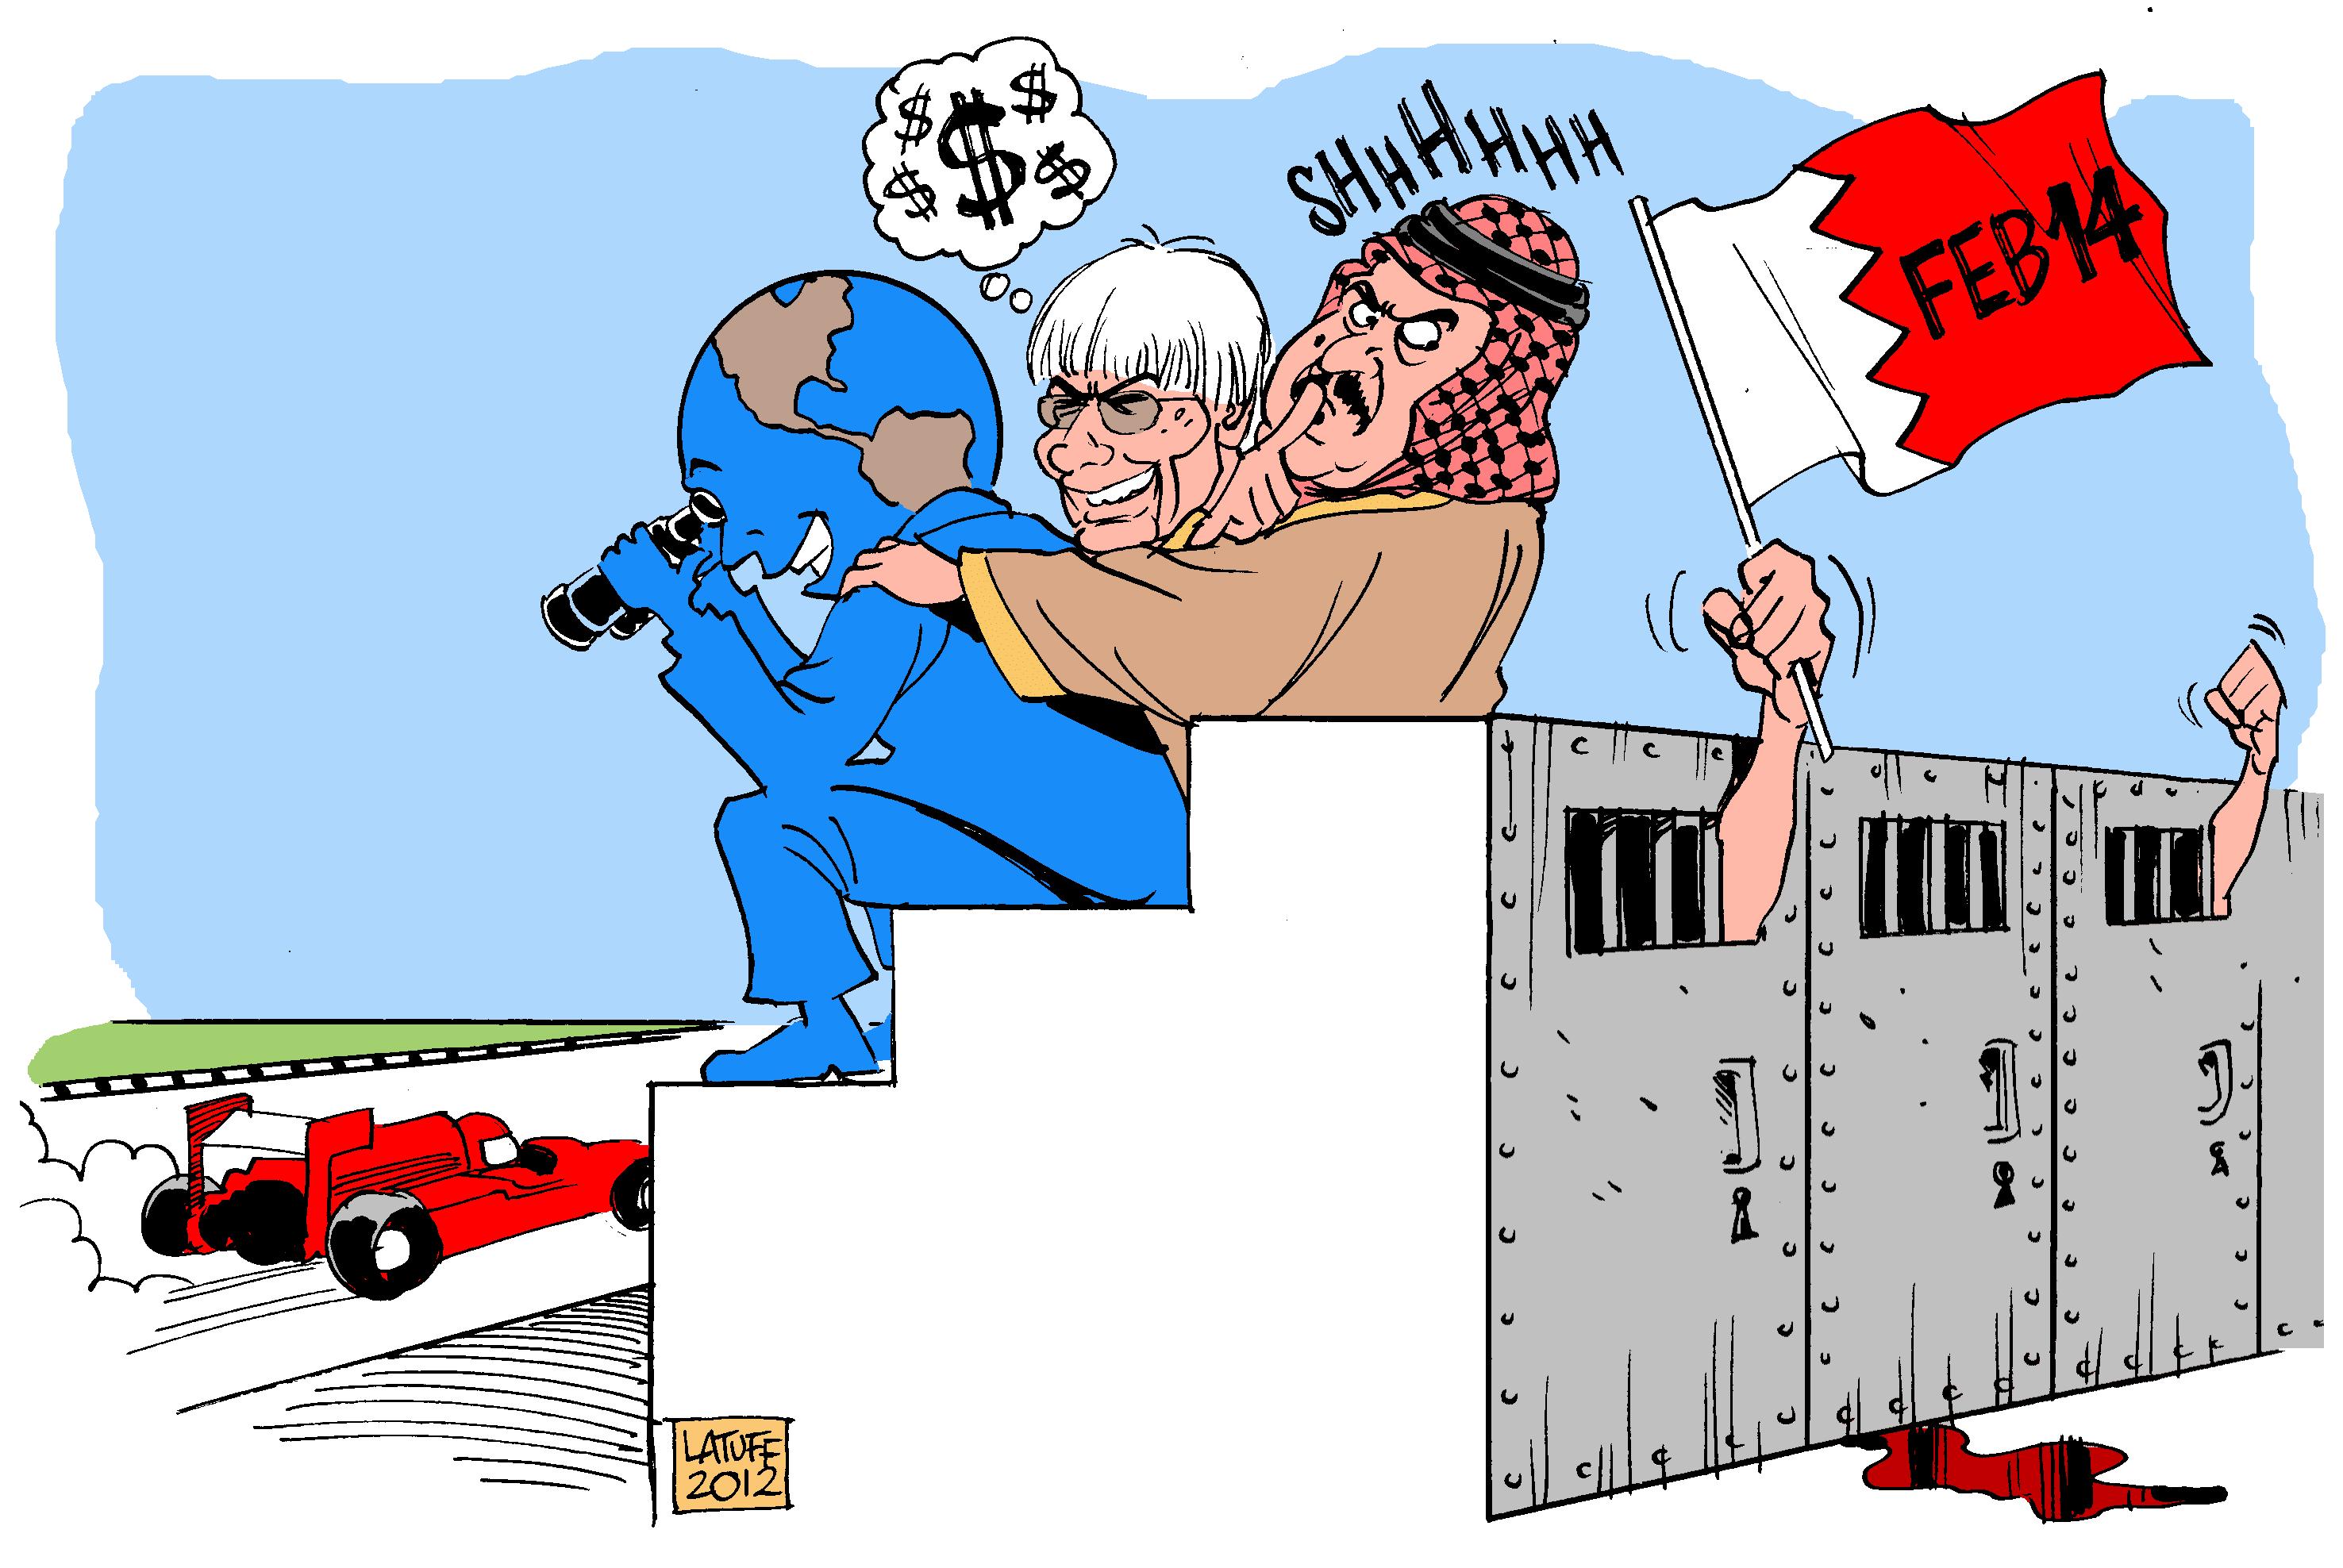 Берни Экклстоун и шейх на трибунах - карикатура Carlos Latuff на тему Гран-при Бахрейна 2012